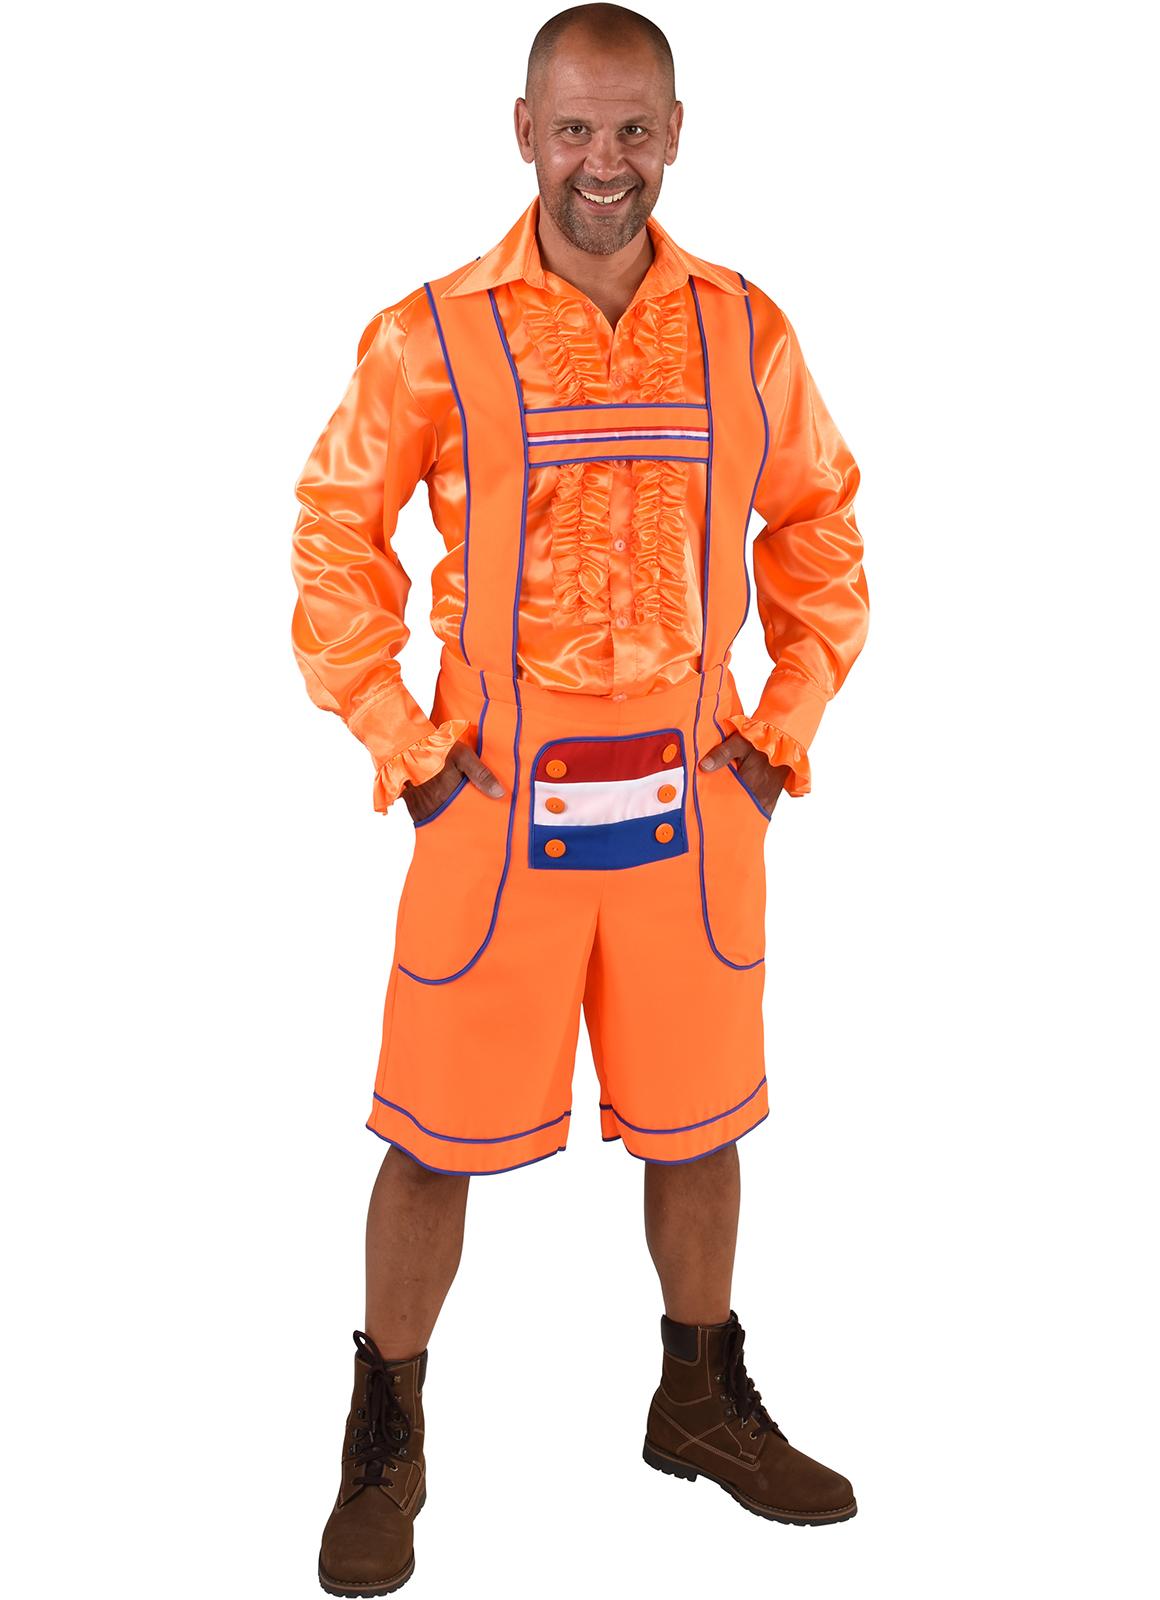 Tiroler Broek Oranje Nederland Heren